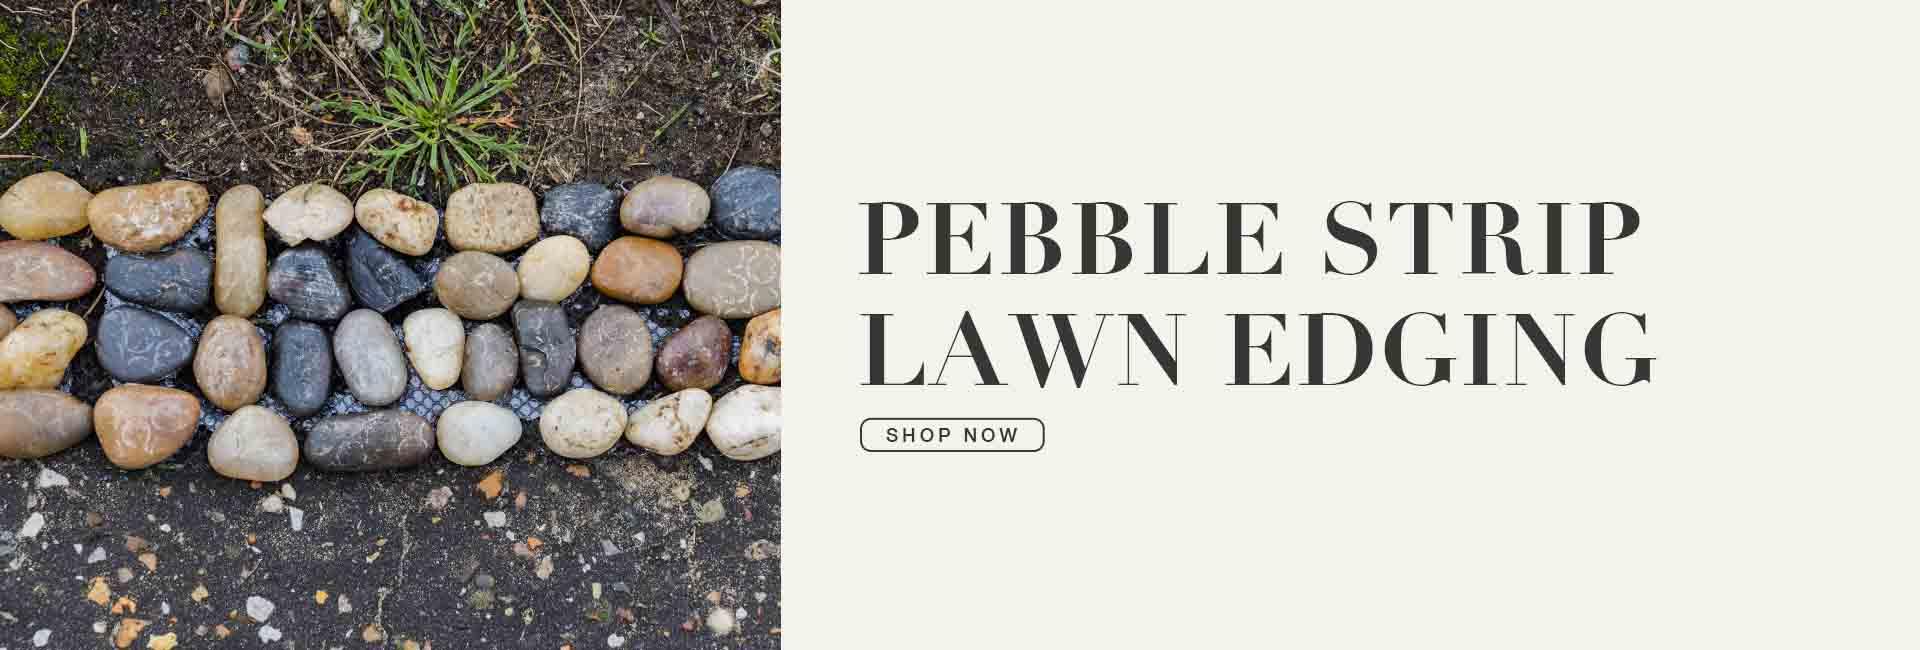 Pebble Strip Mixed